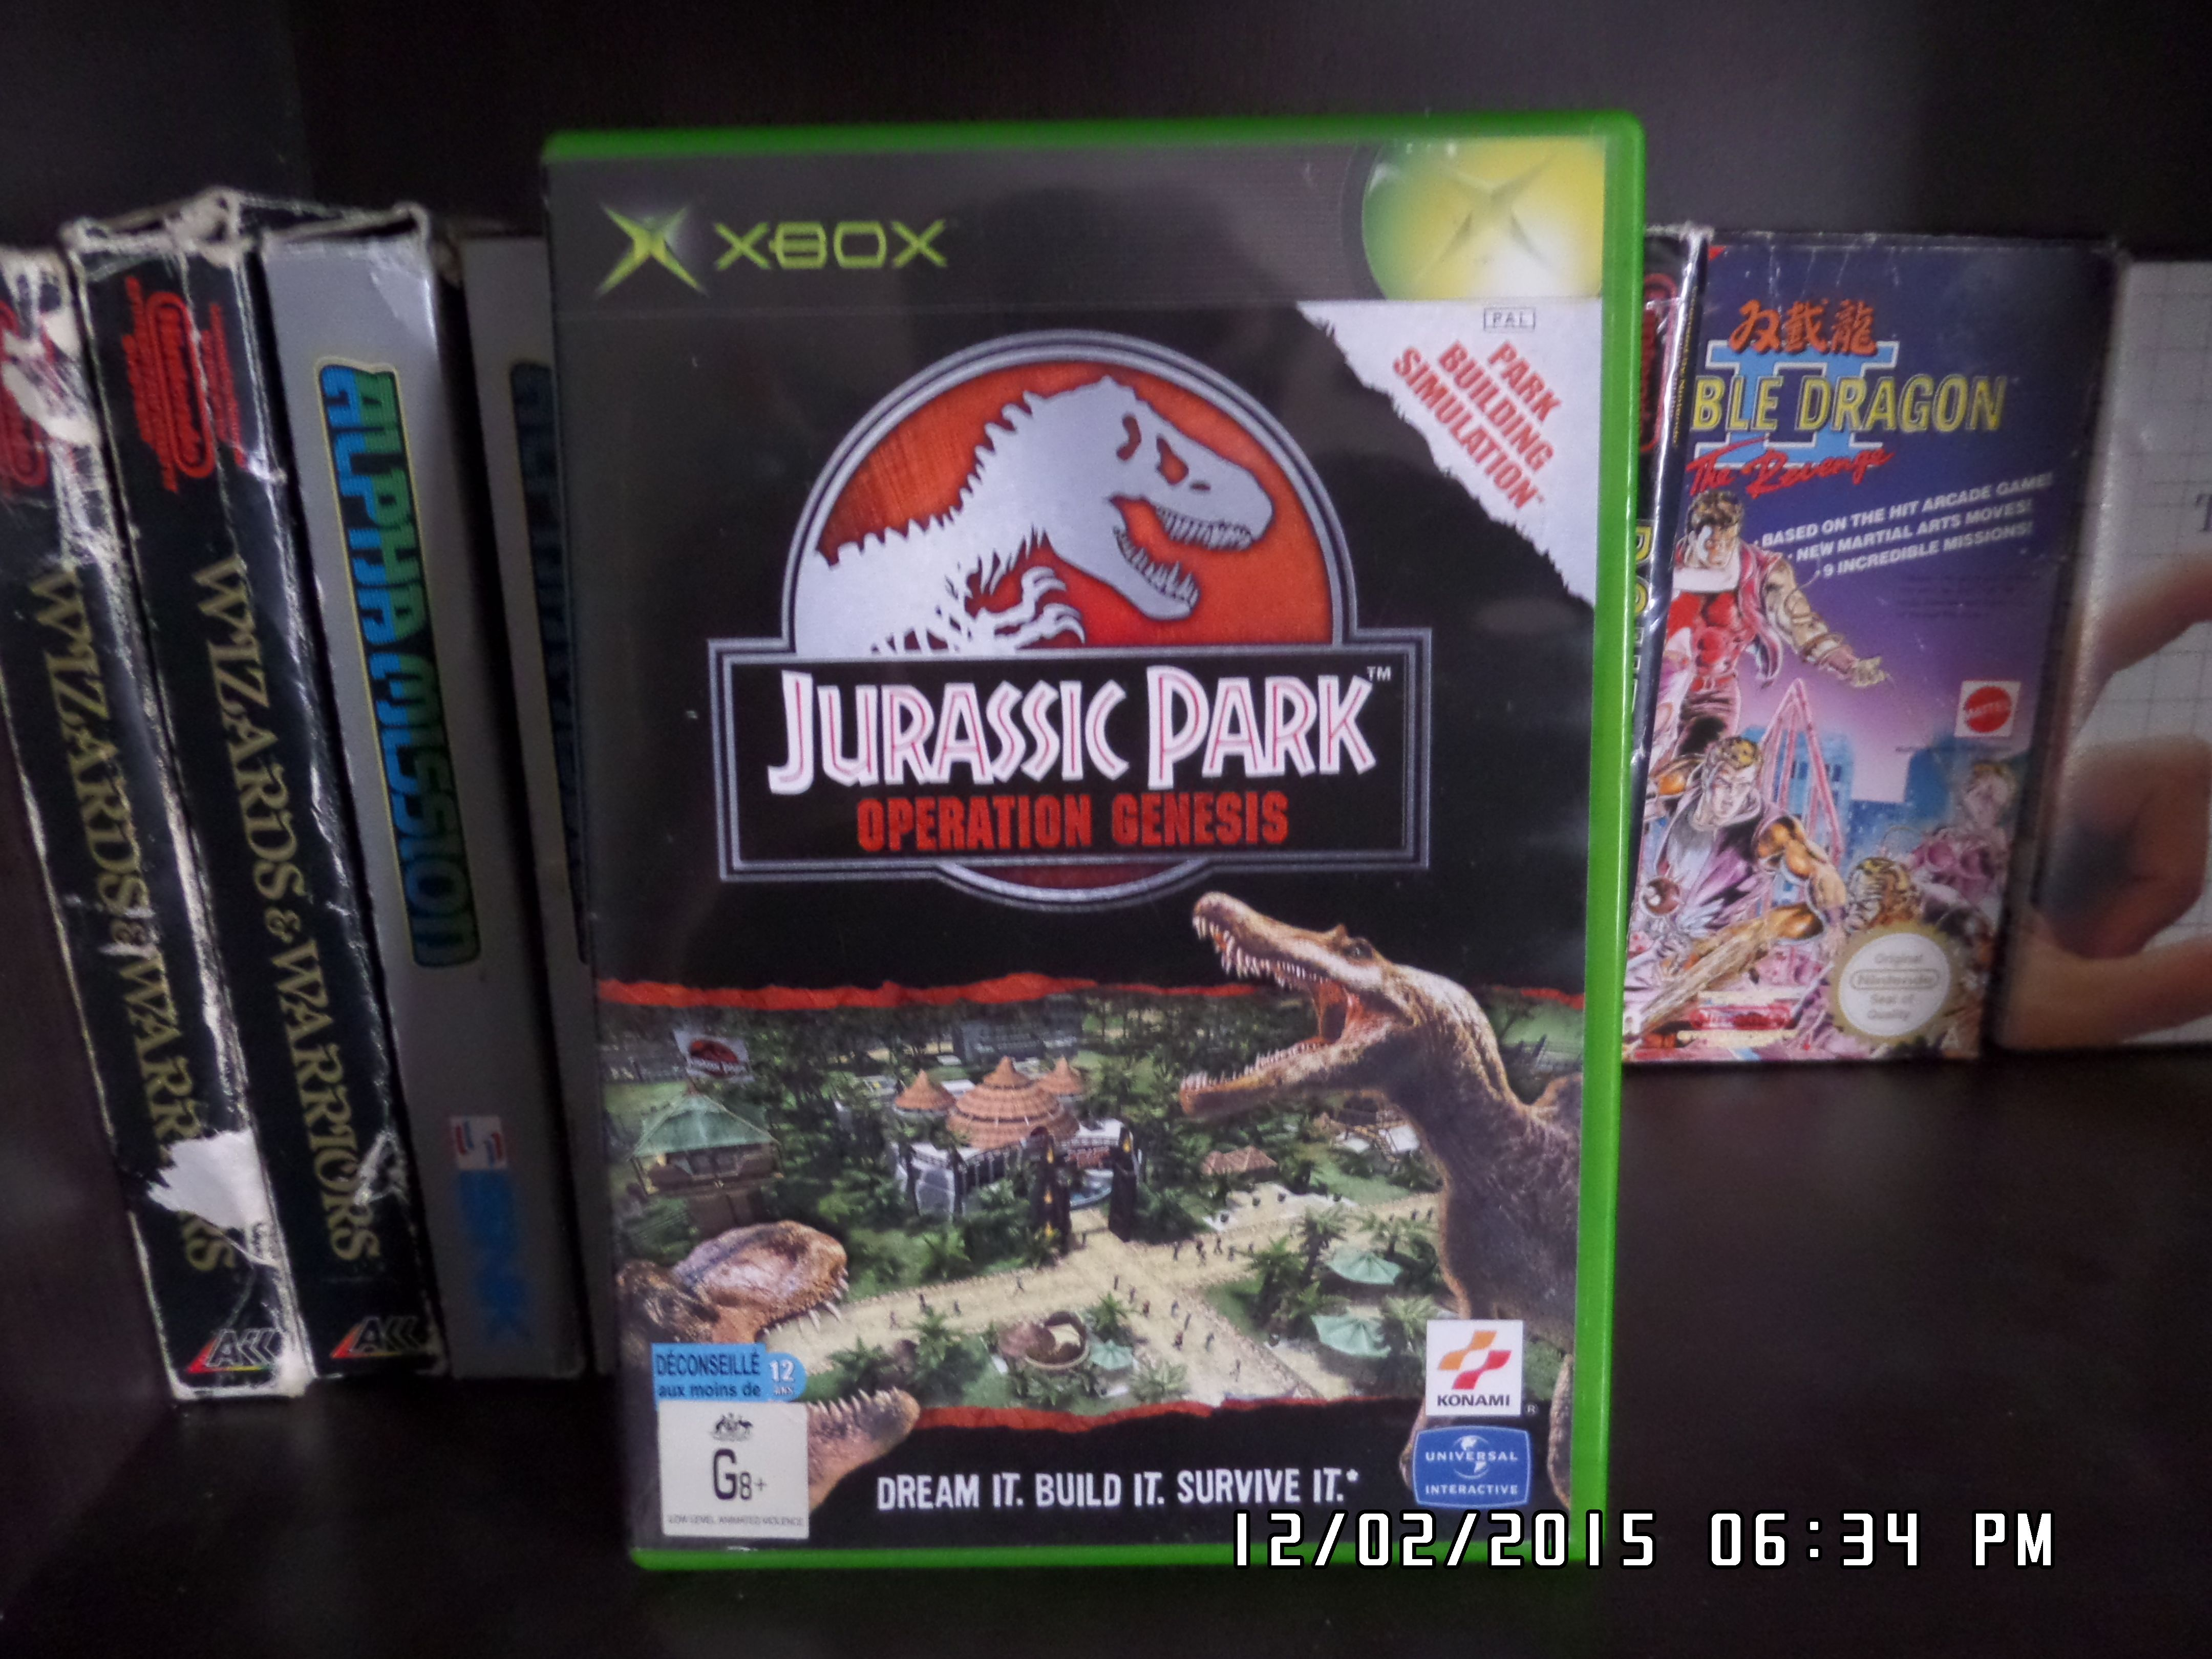 Jurassic Park Operation Genesis (2003) The player's main